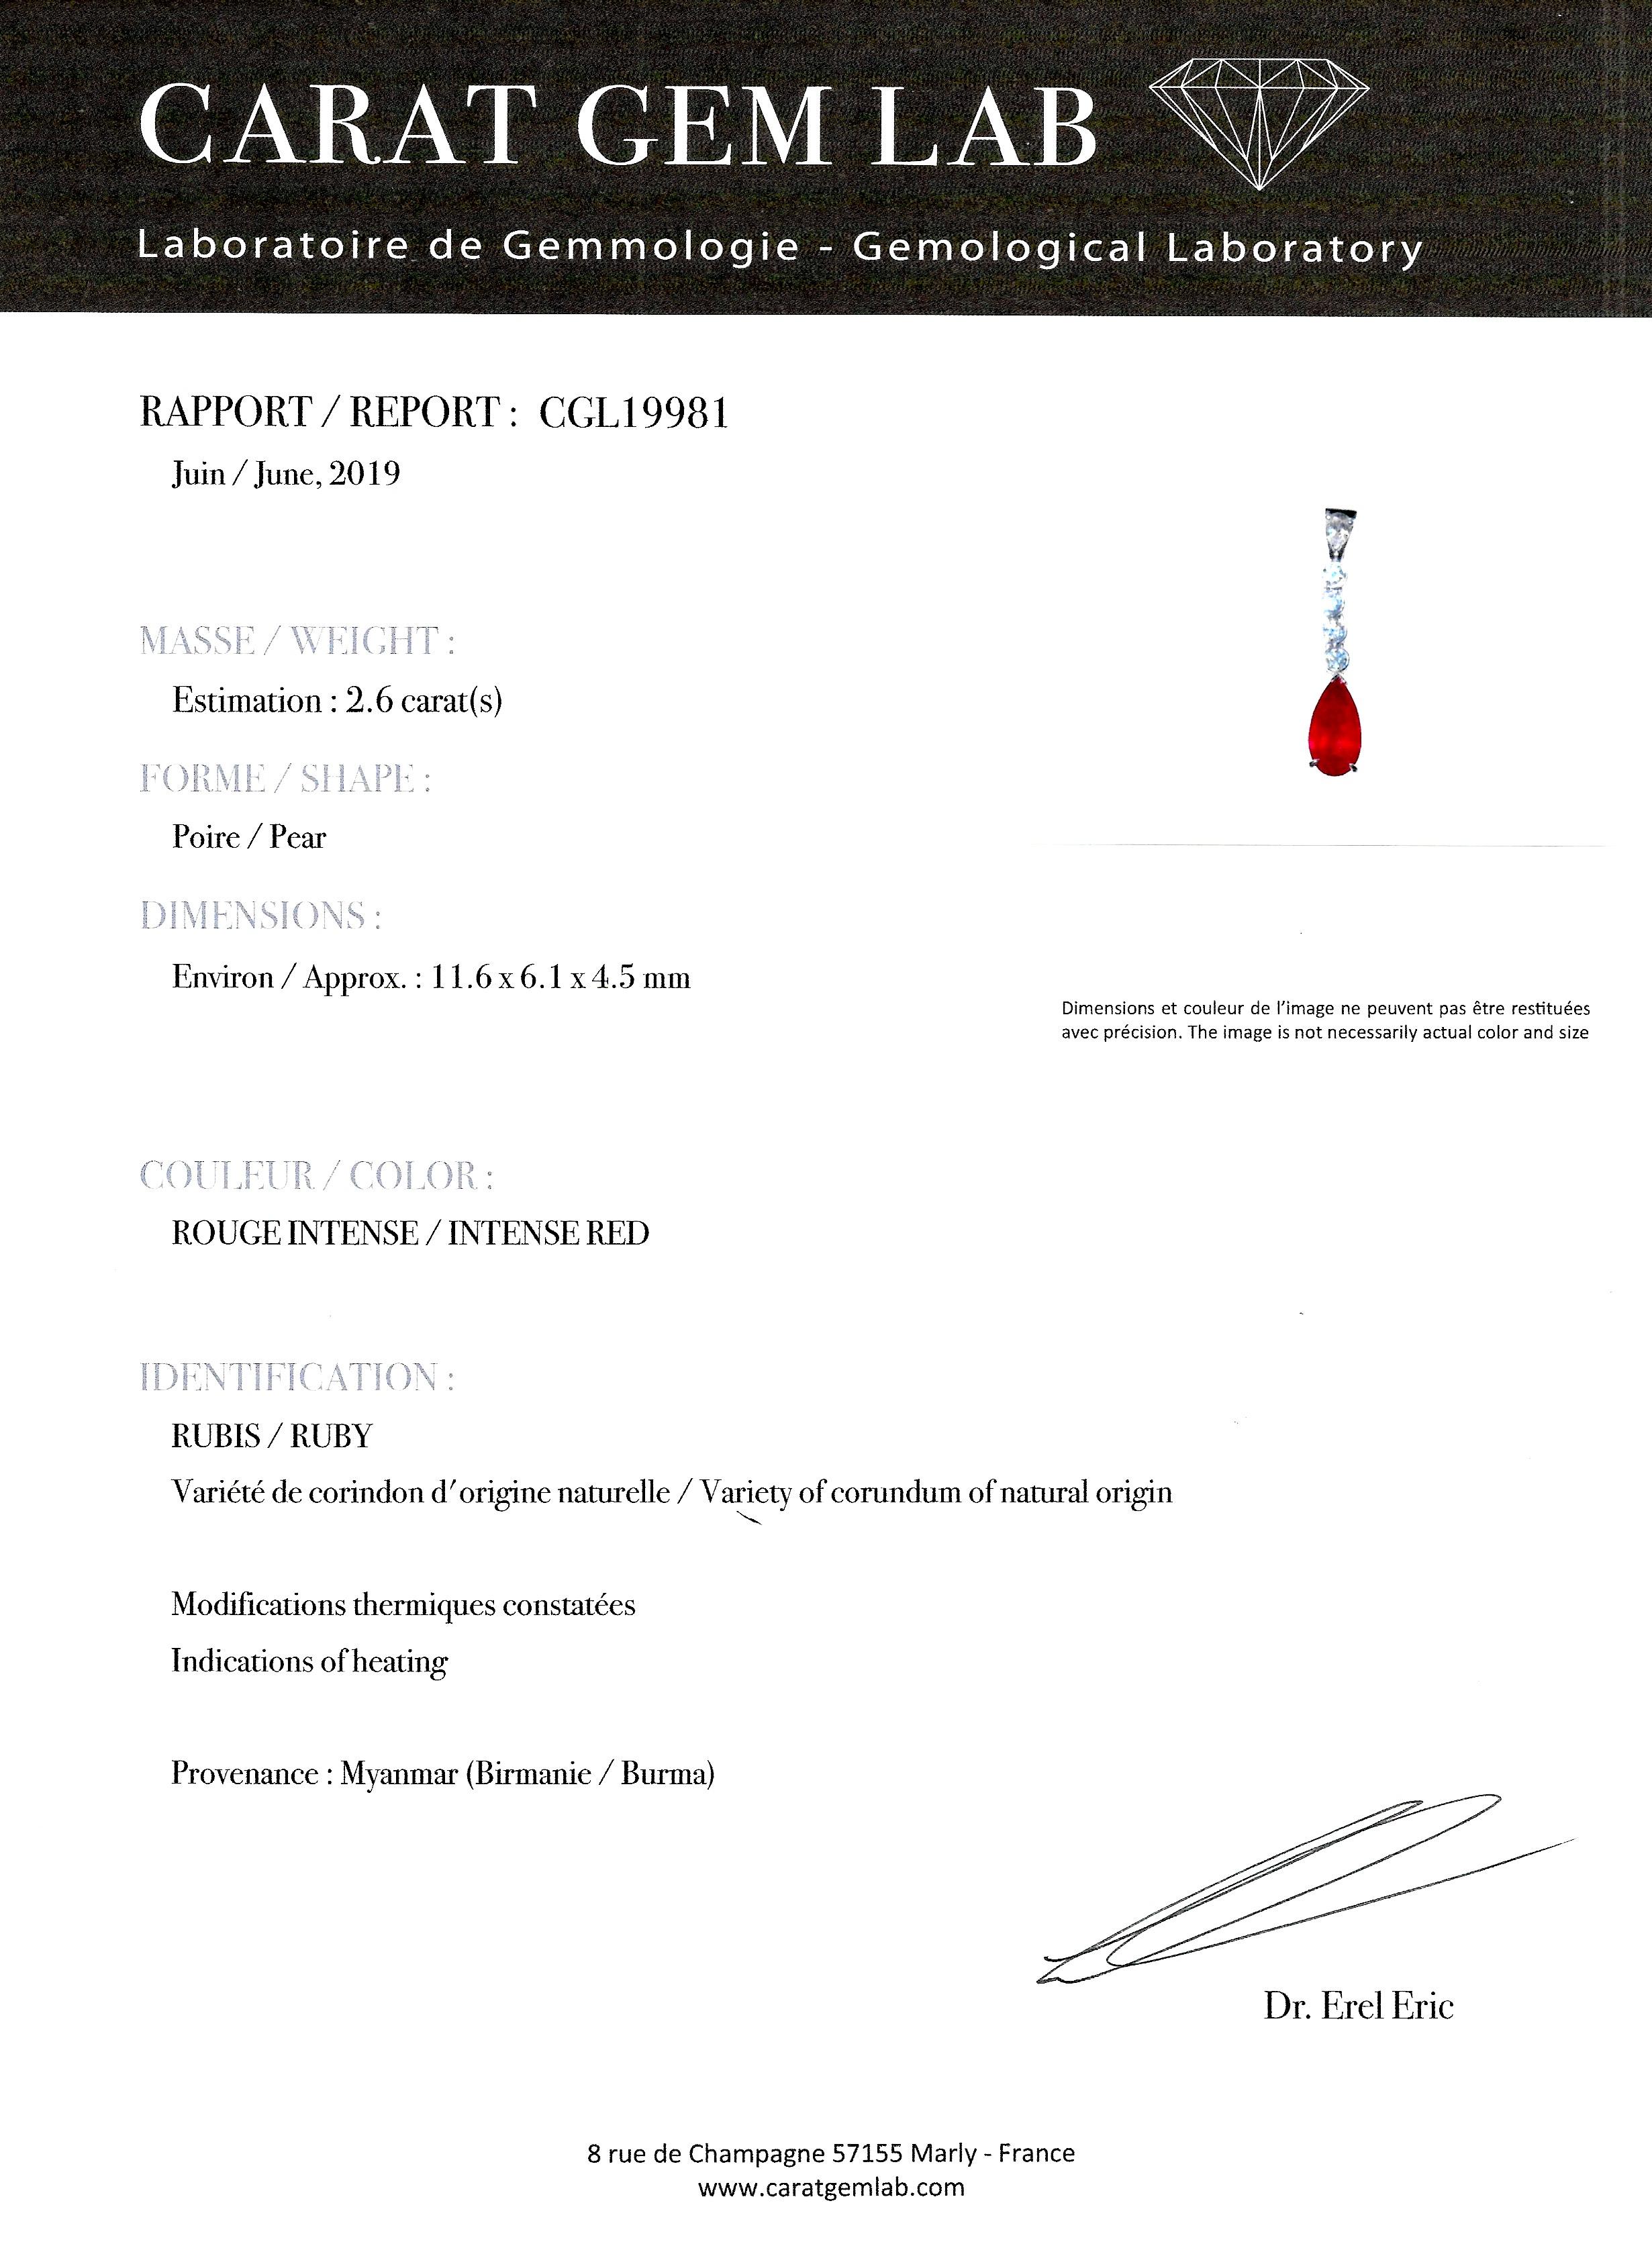 Pendentif rubis birman rouge intense (2,60 carats – Certificat Carat Gem Lab) diamants-2